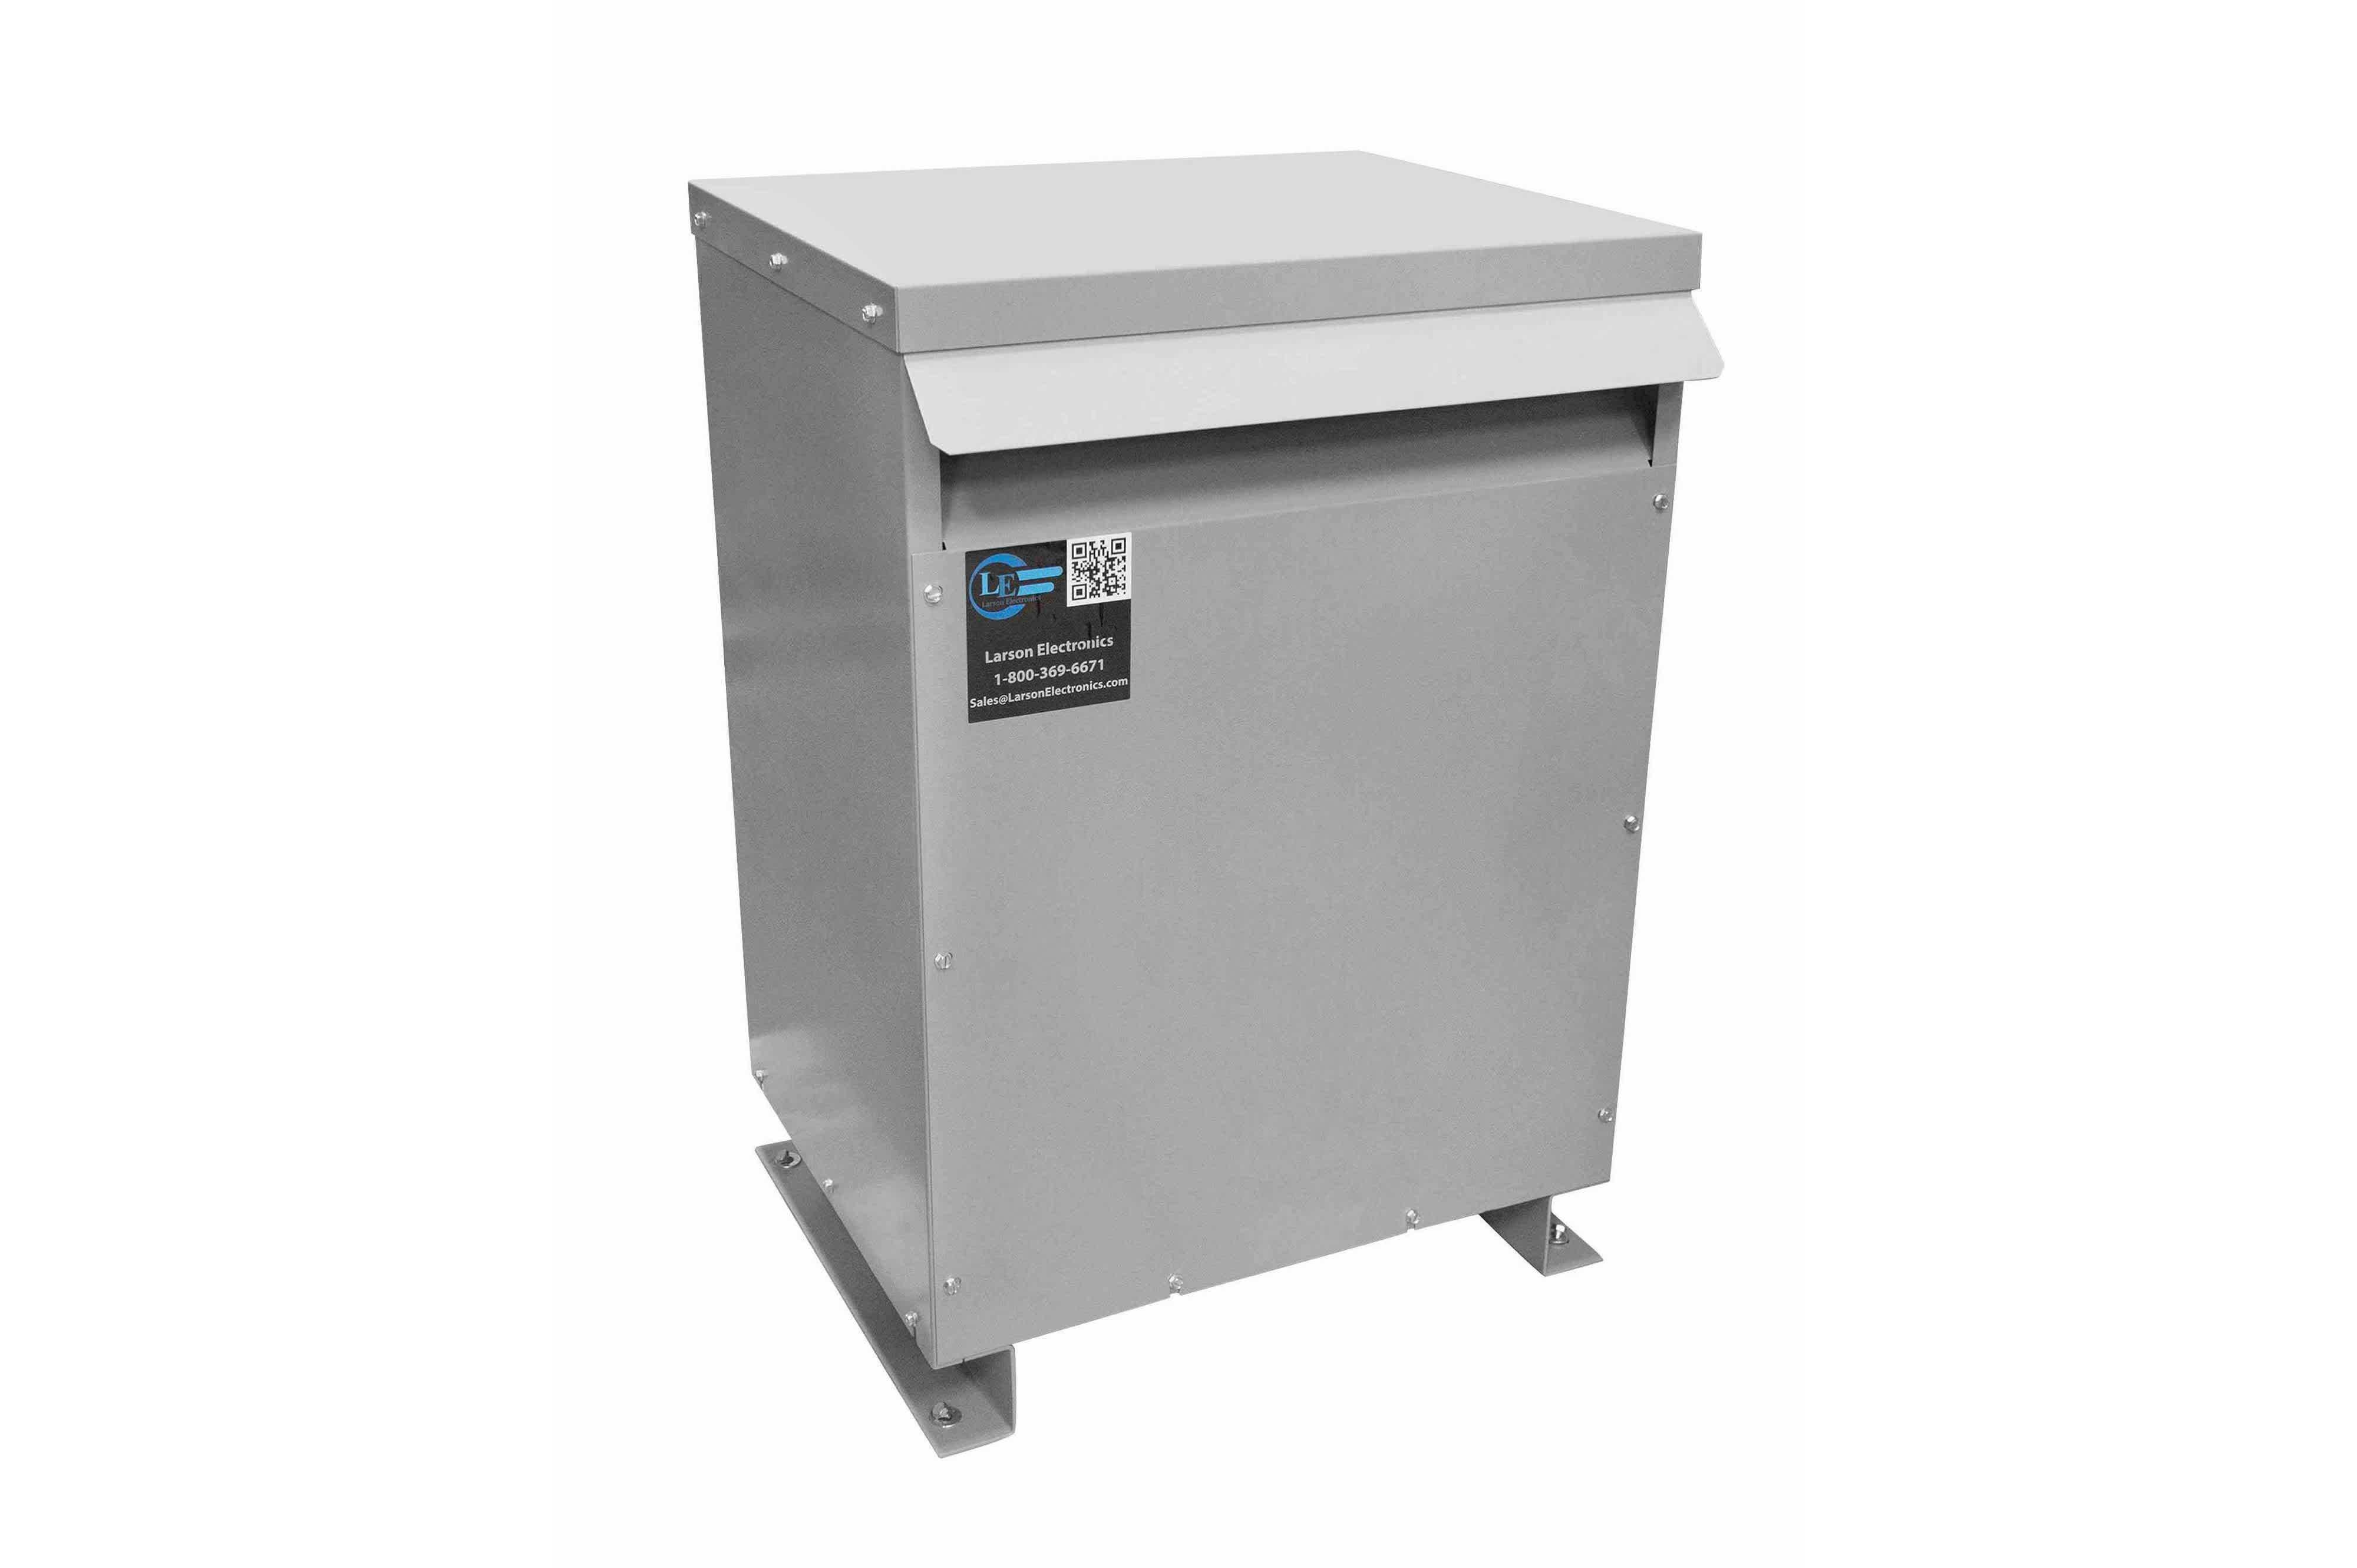 237.5 kVA 3PH Isolation Transformer, 220V Wye Primary, 208Y/120 Wye-N Secondary, N3R, Ventilated, 60 Hz